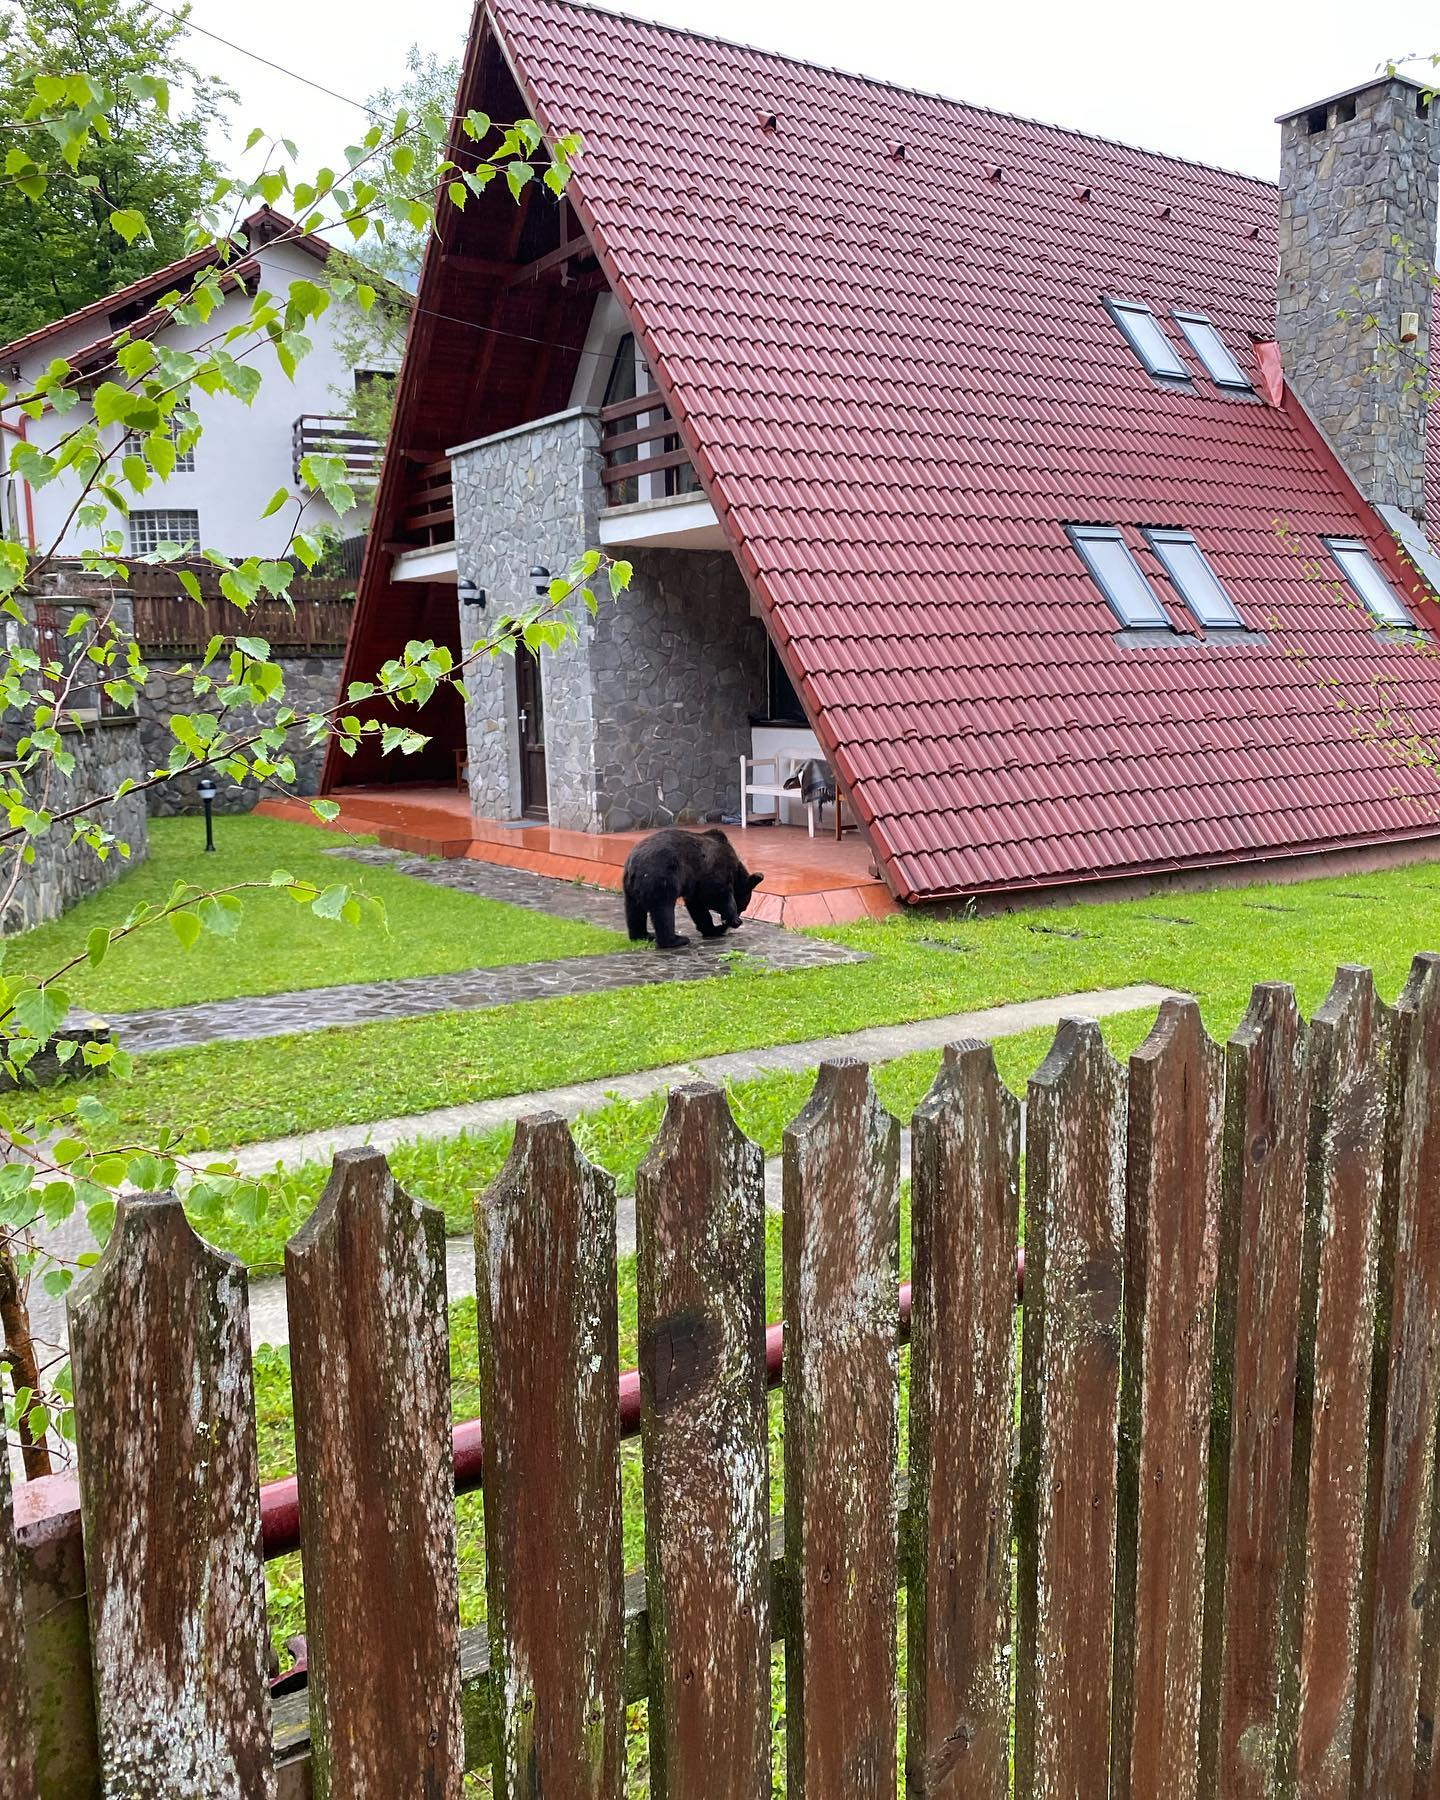 VIDEO | Pui de urs filmat in curtea unei case, la Sinaia